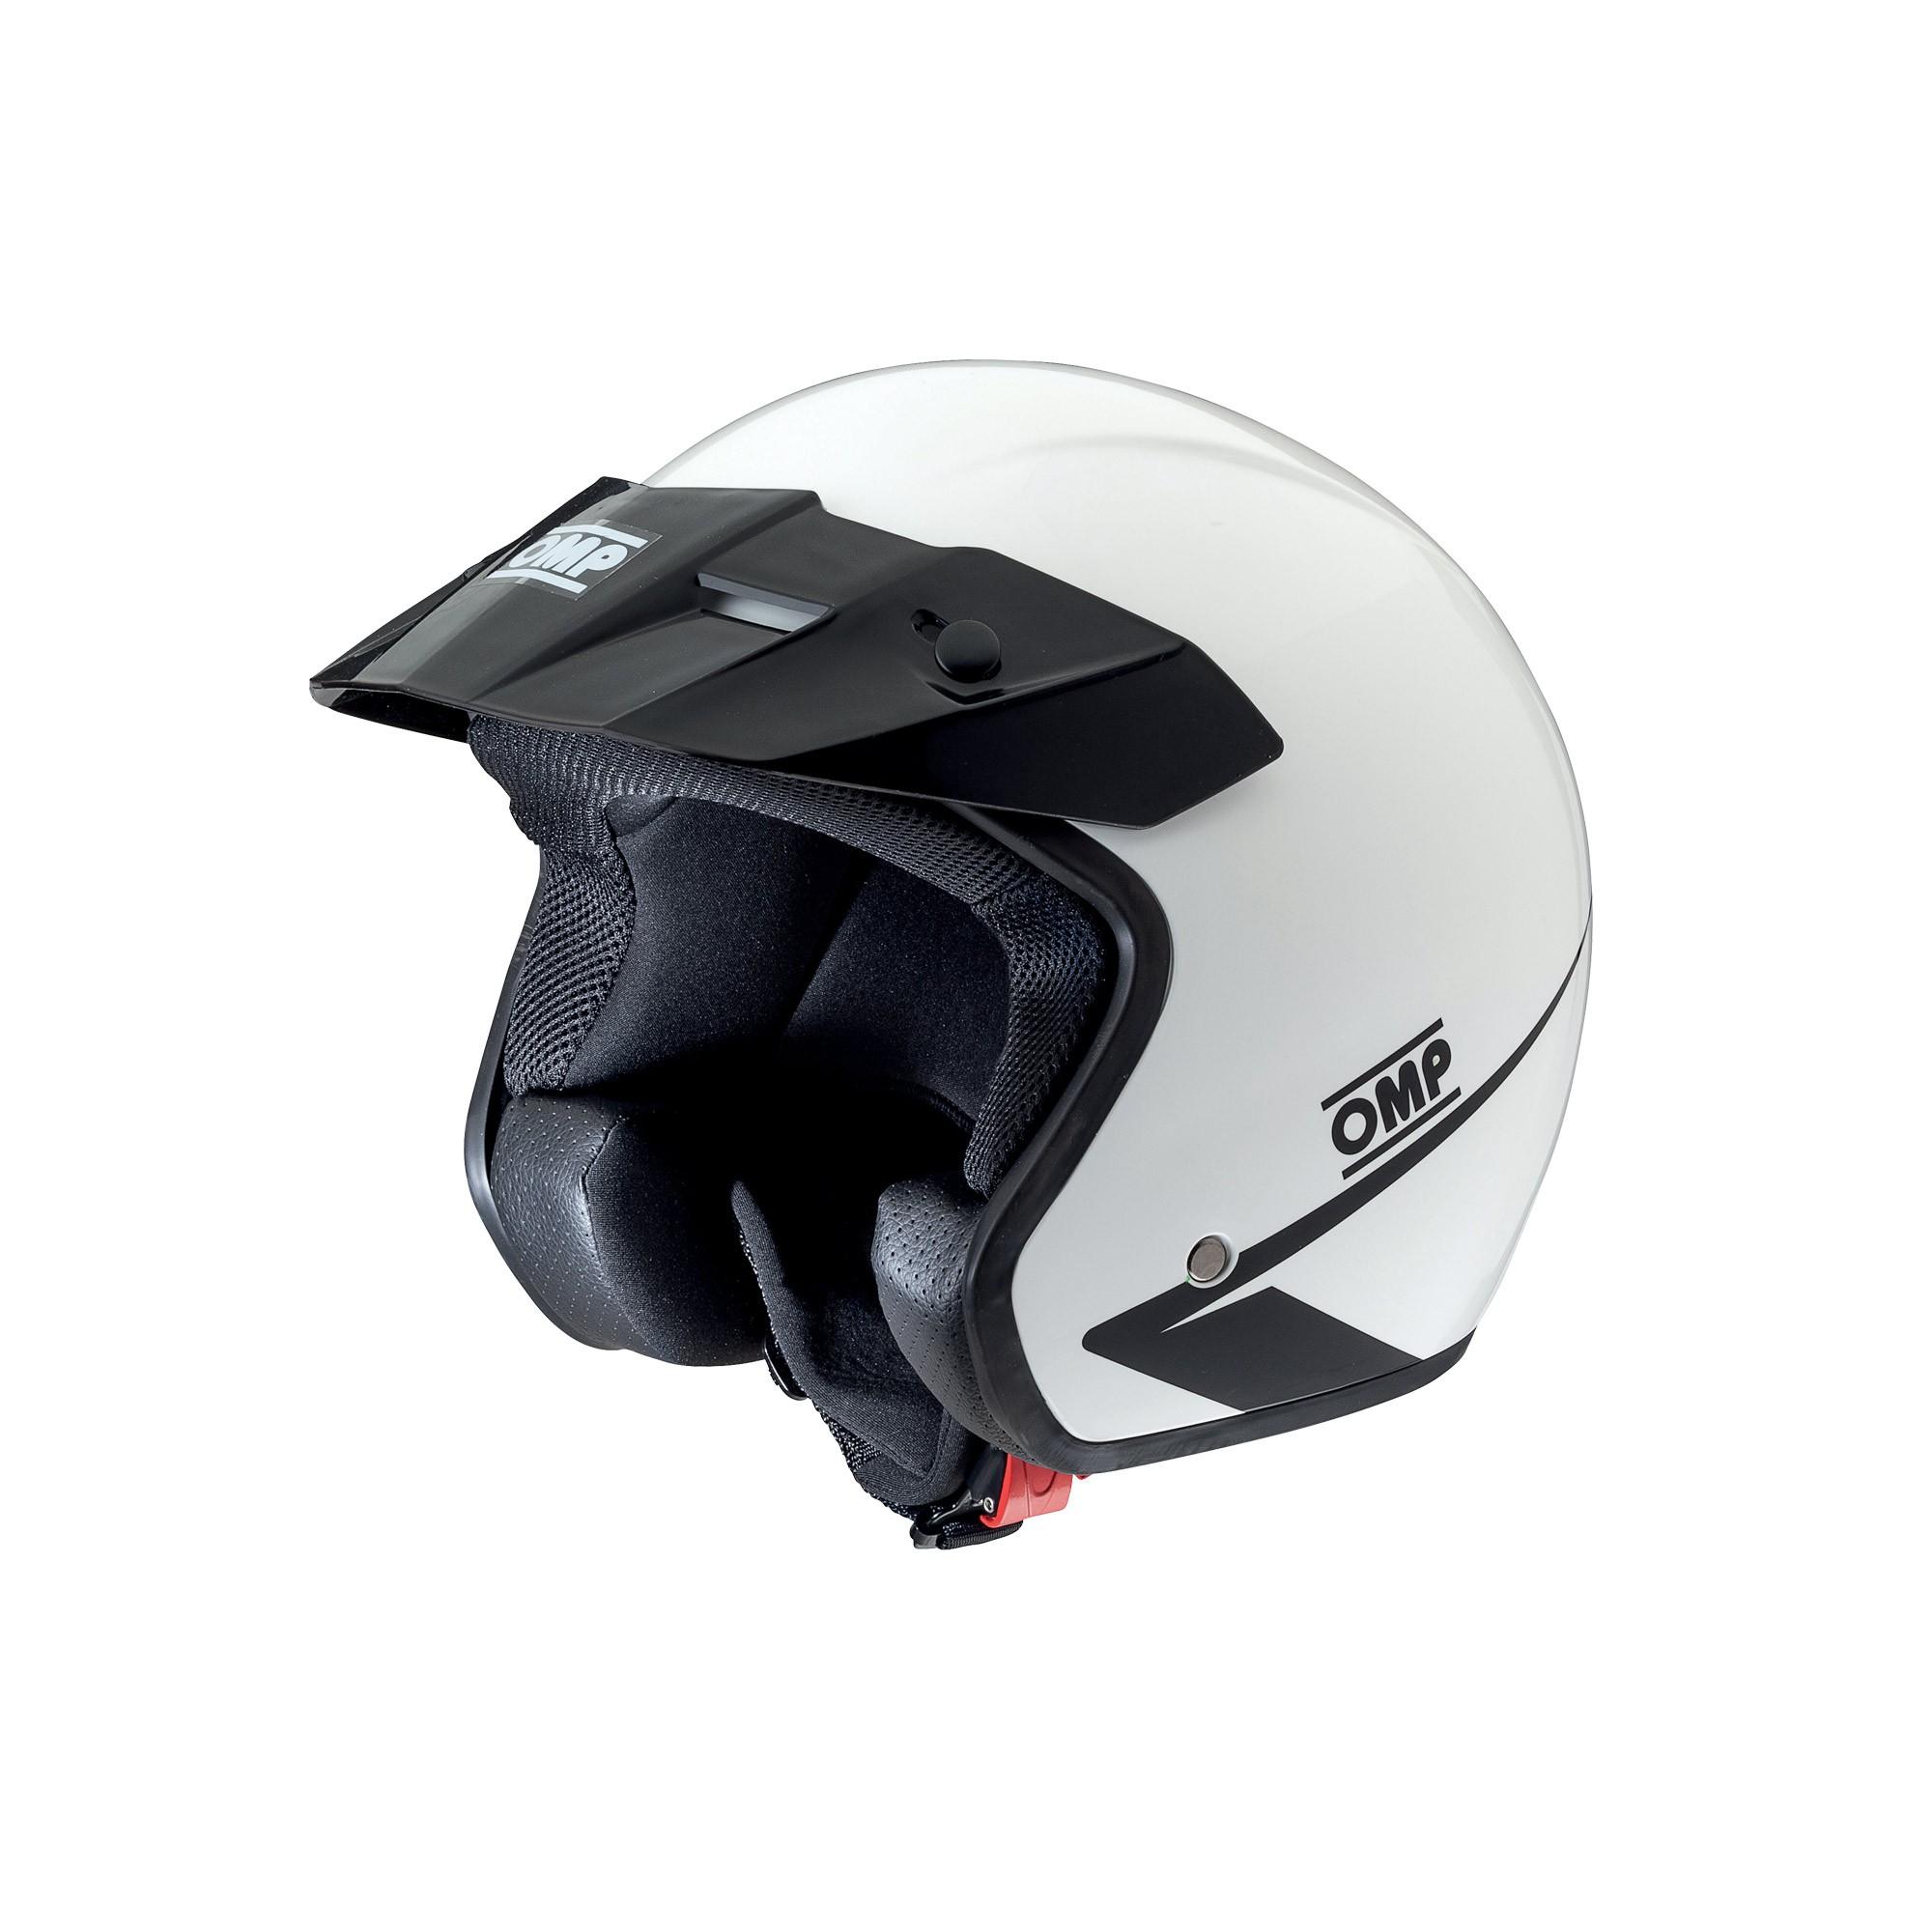 Racing helmets - STAR MY2017